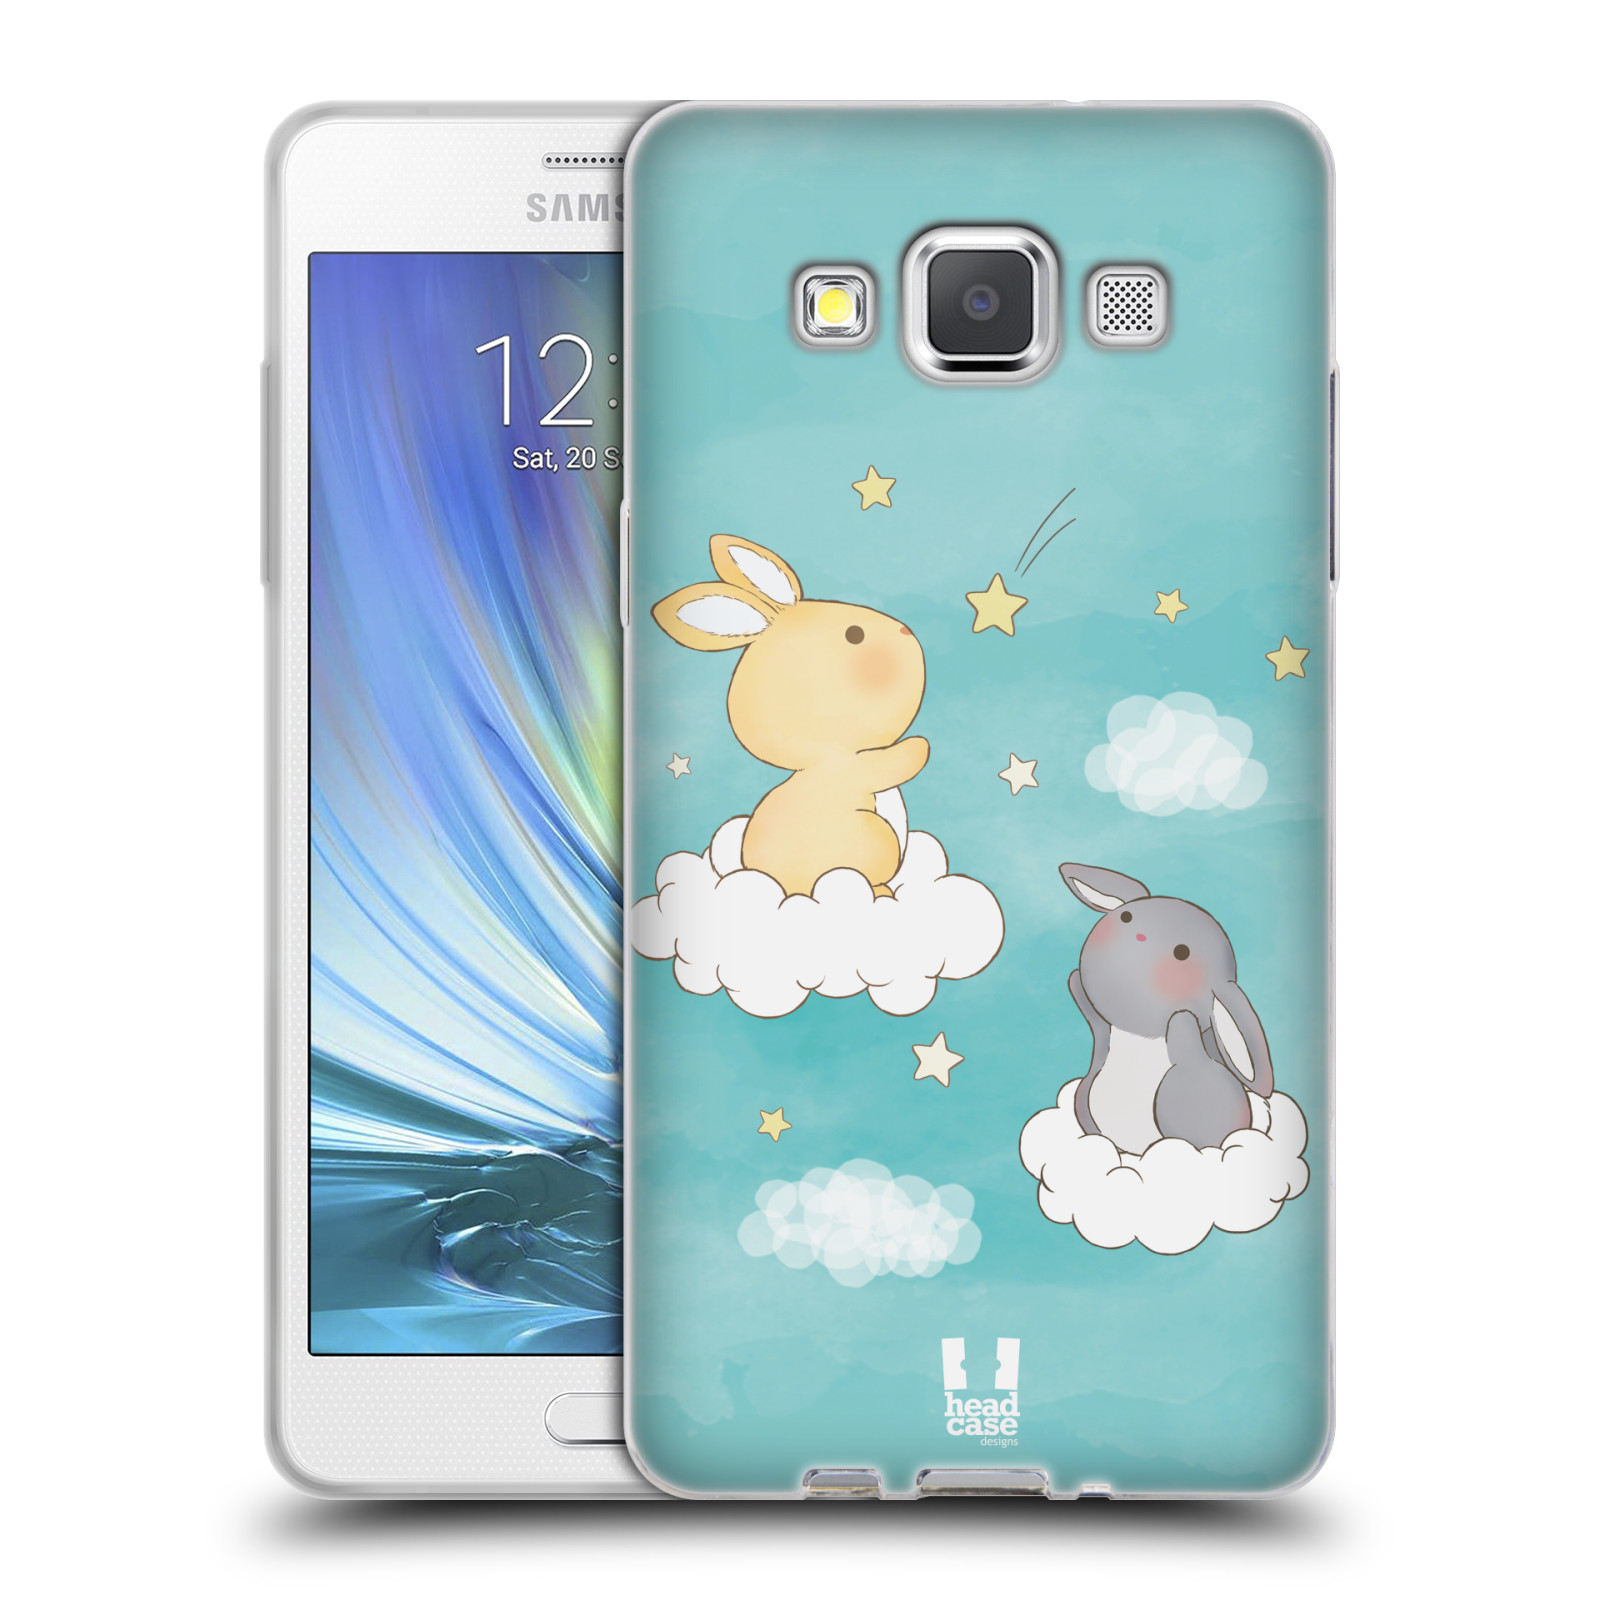 HEAD CASE silikonový obal na mobil Samsung Galaxy A5 vzor králíček a hvězdy modrá